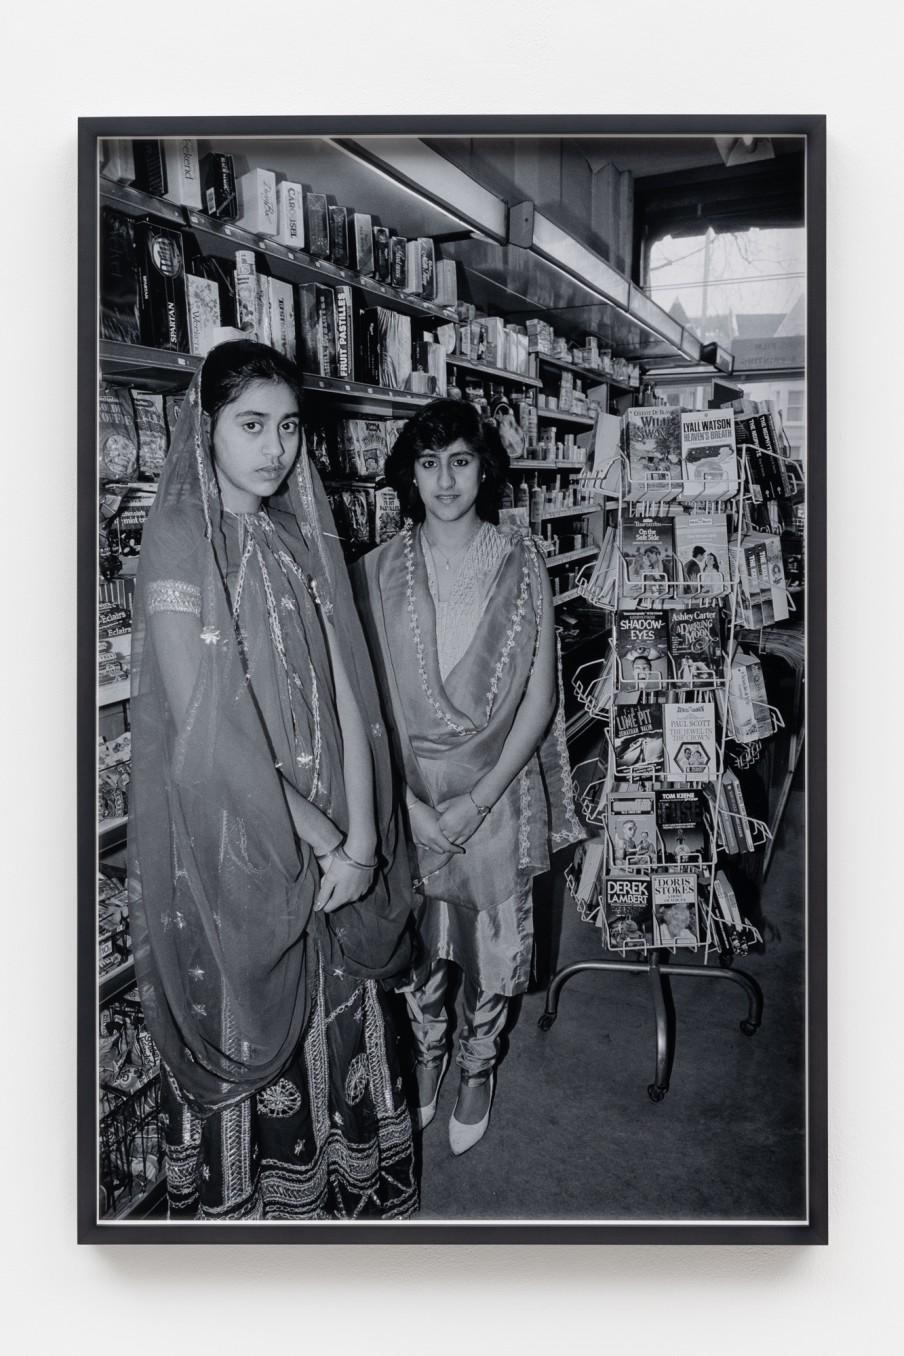 Sunil Gupta Shopkeepers, 1986/2021 Archival inkjet print Print: 90.9 x 59.5 cm 35 3/4 x 23 3/8 in